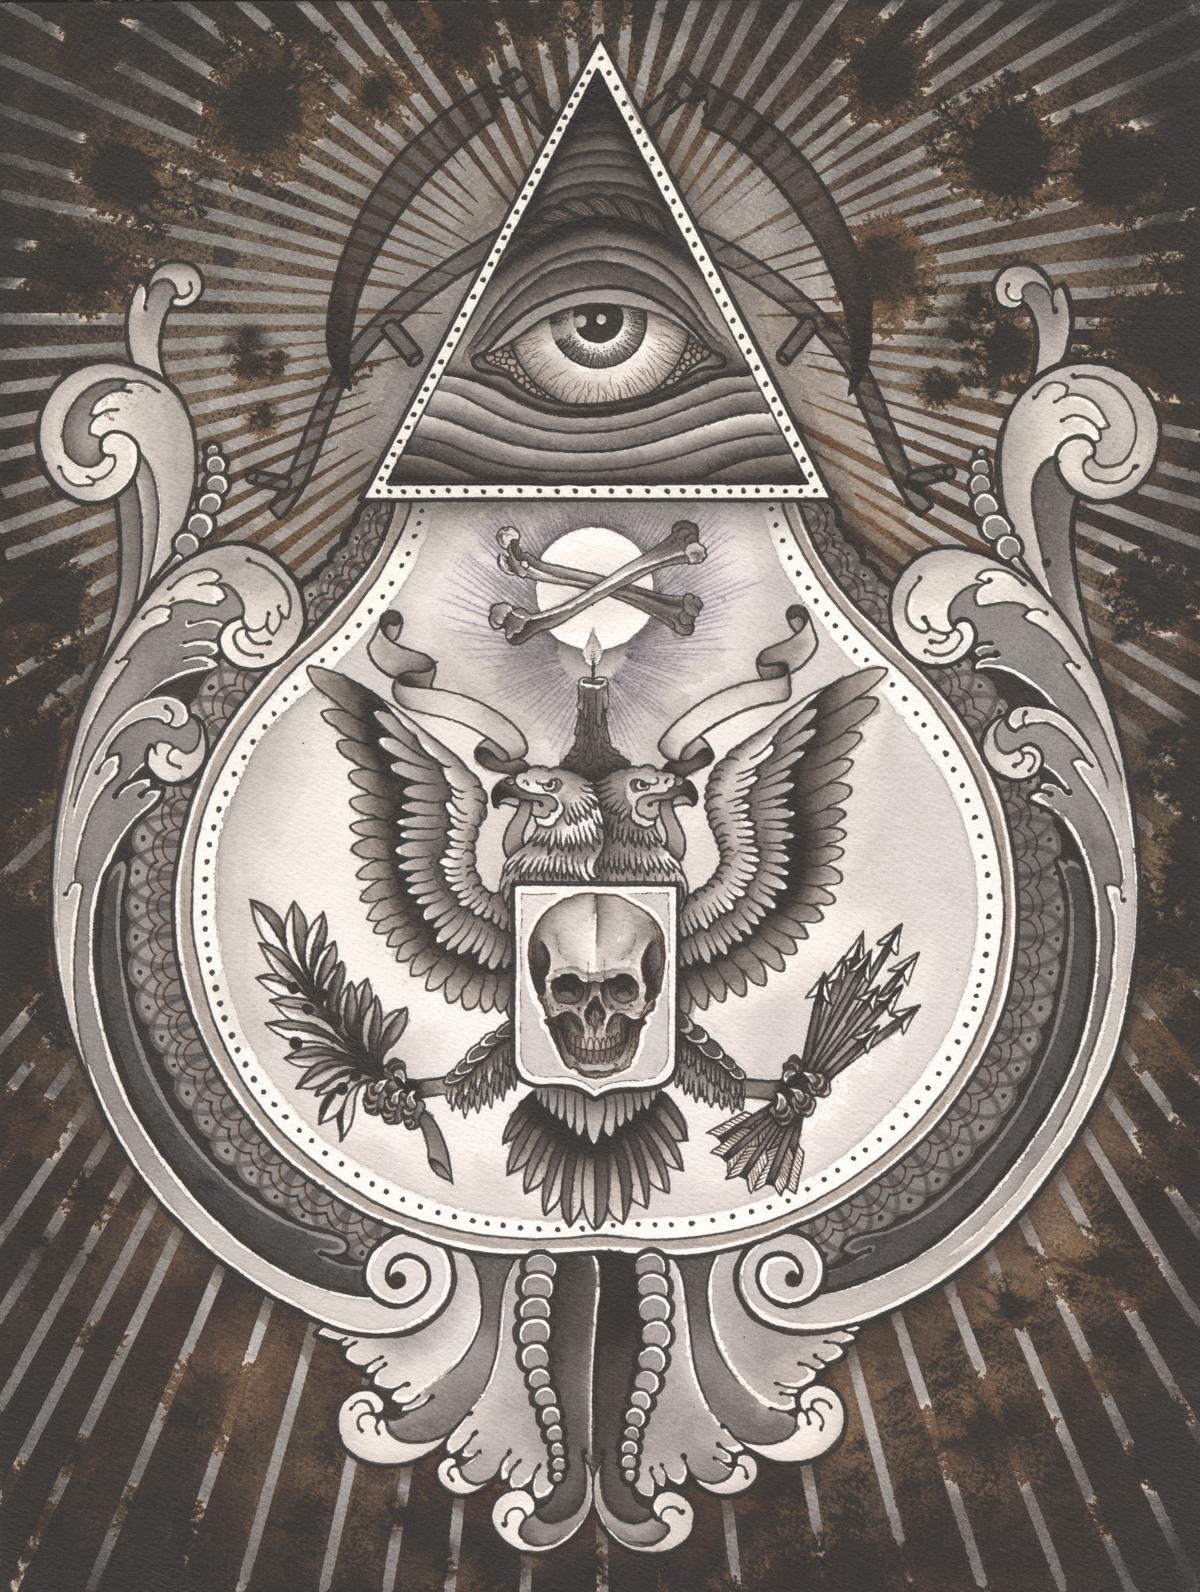 Illuminati eye tattoo images designs for State of the art tattoo